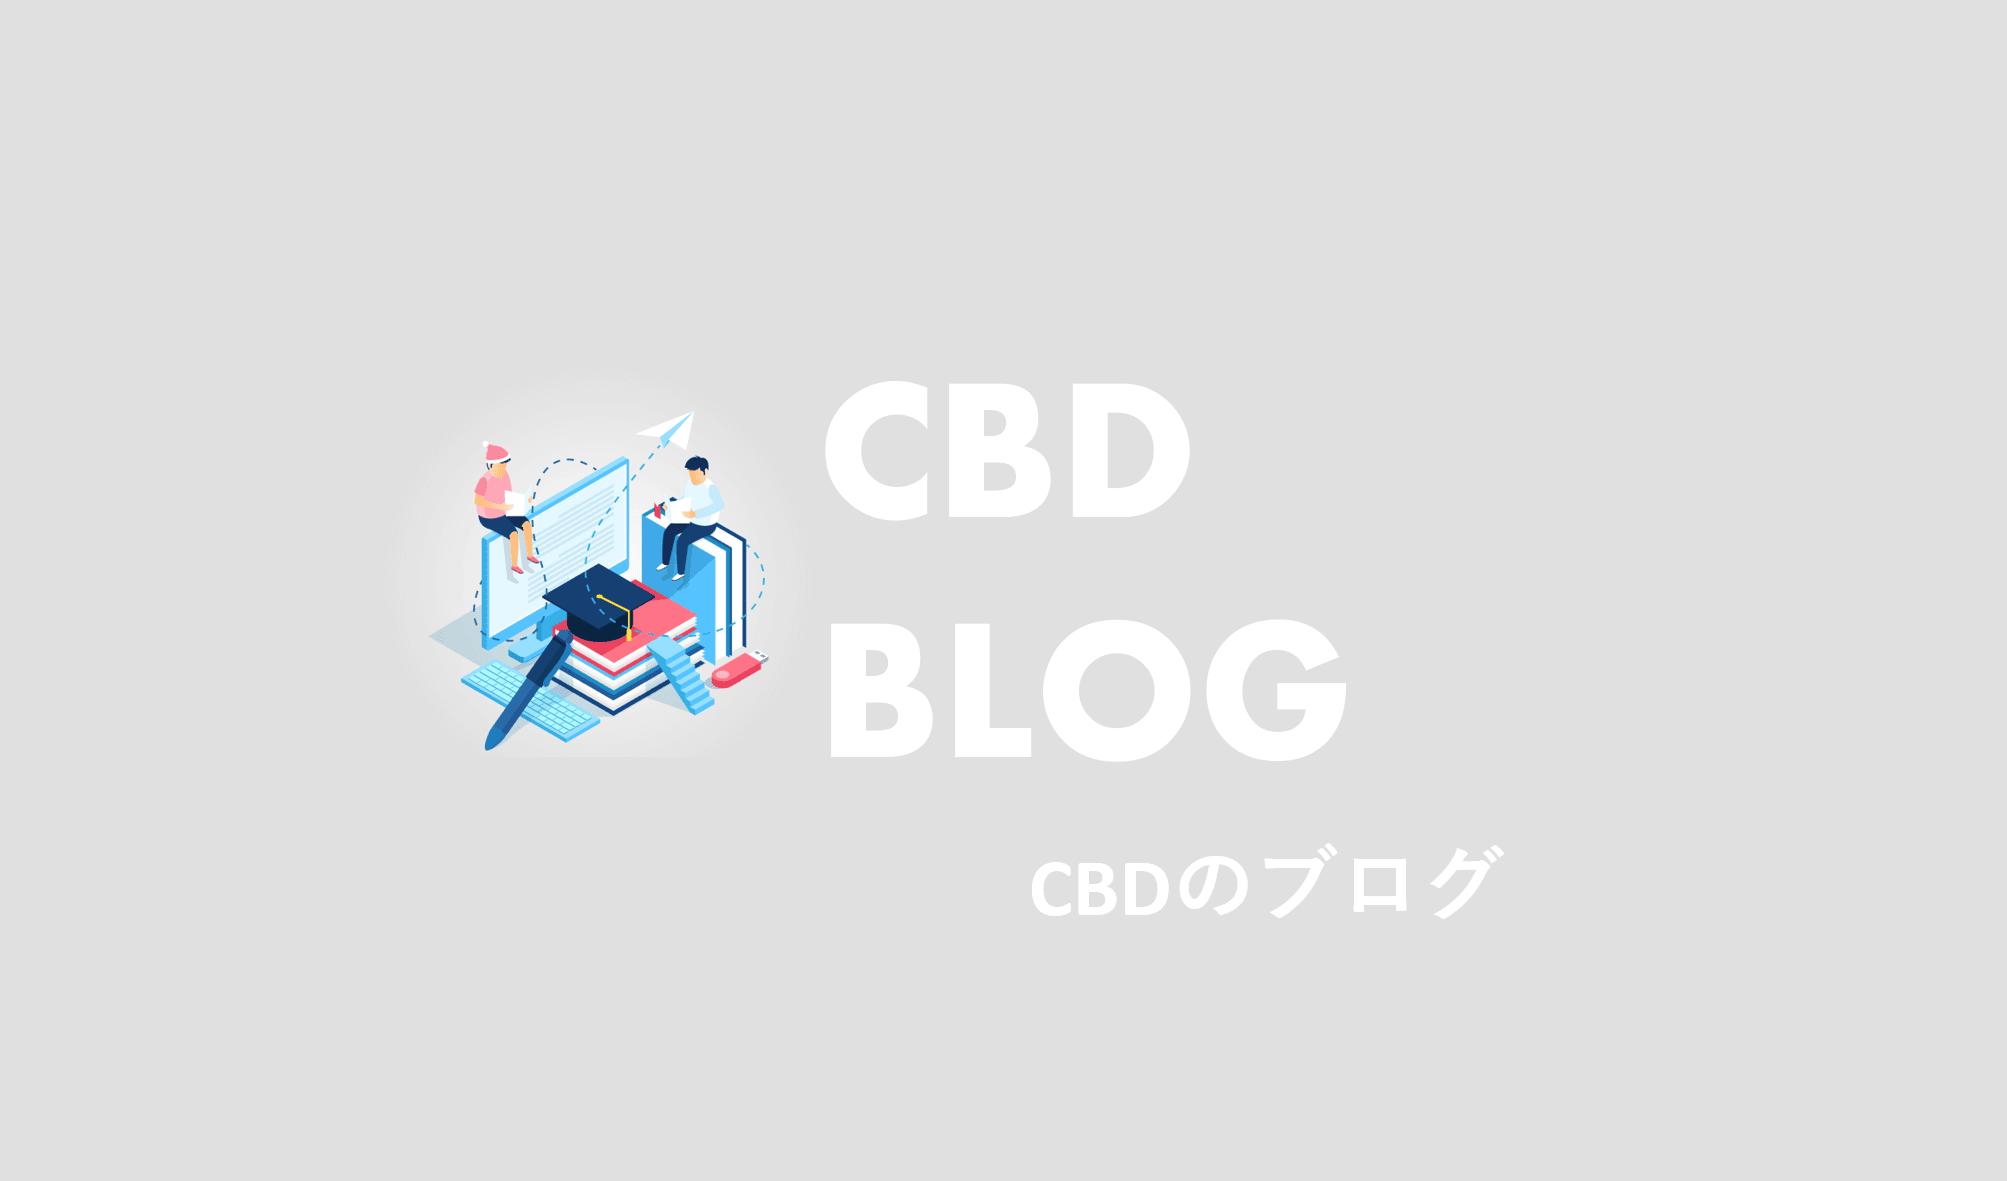 CBDブログ